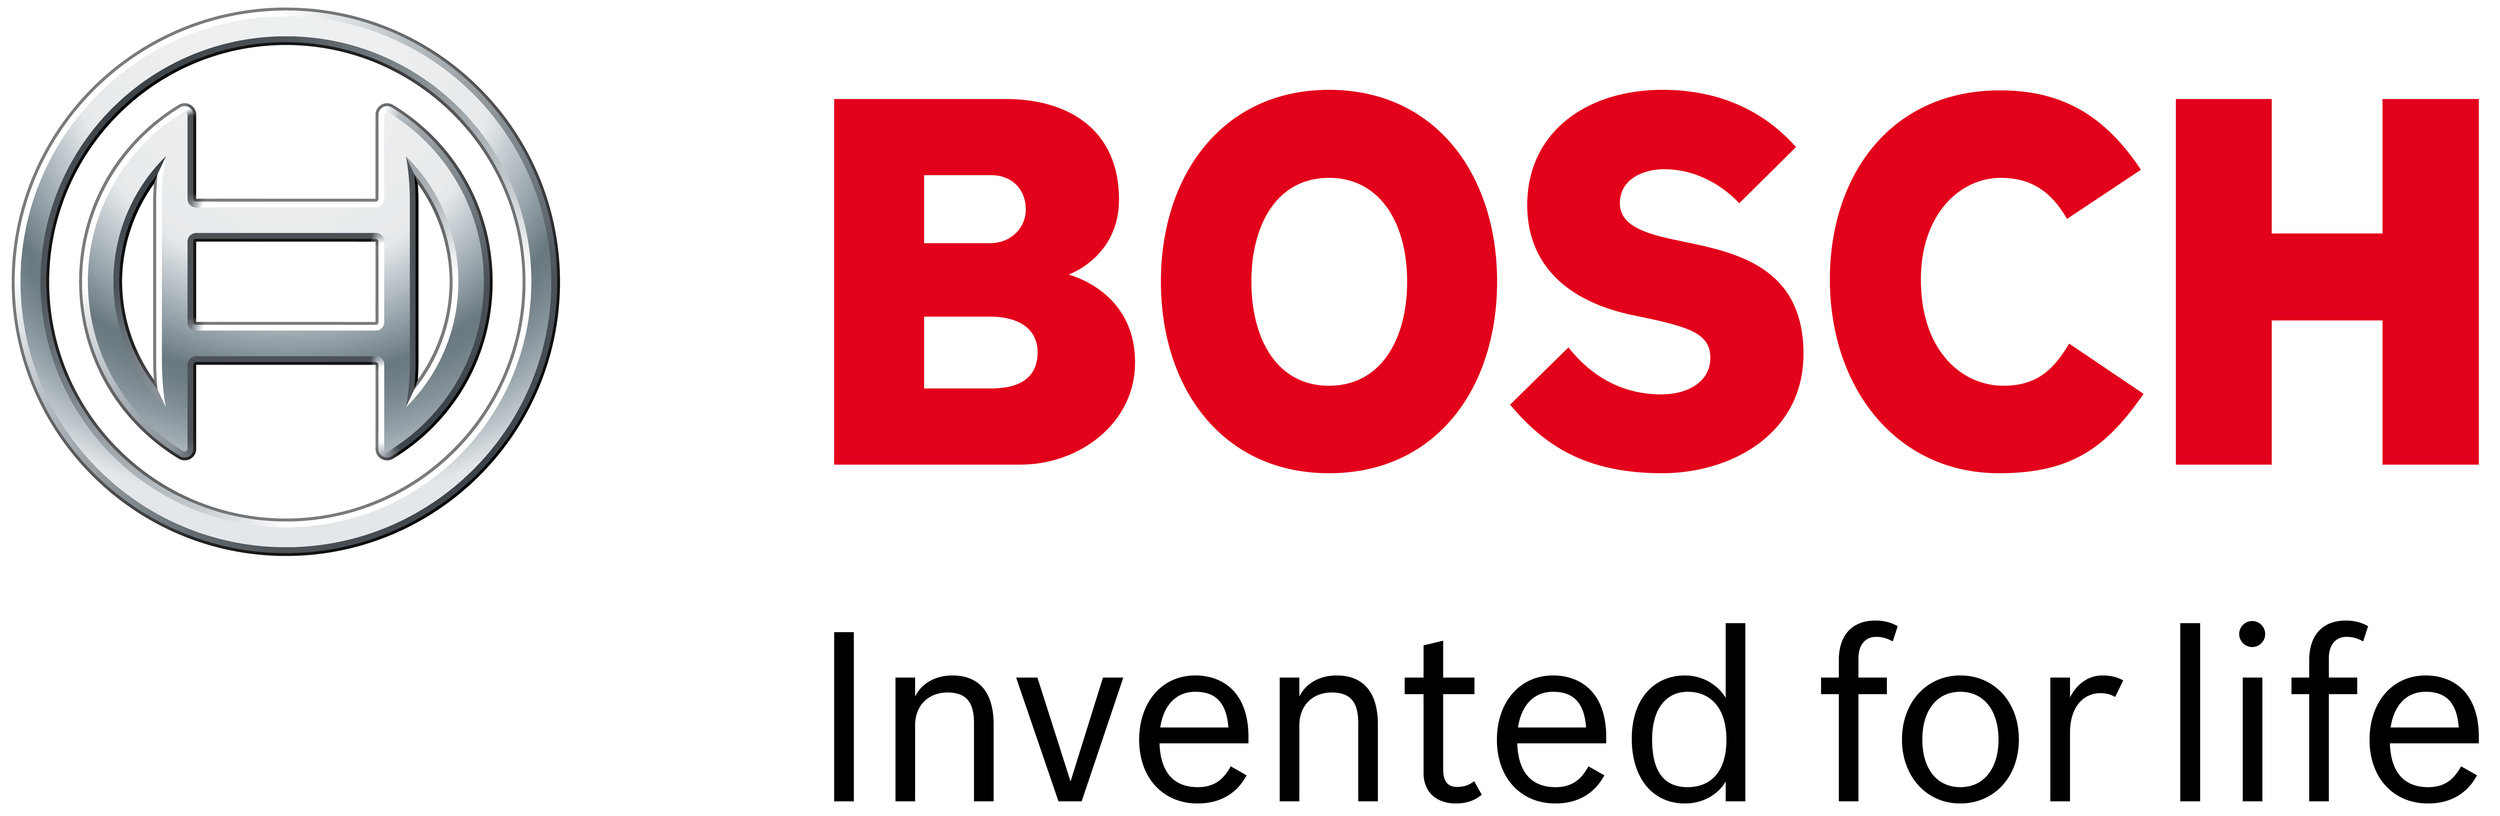 Bosch-Logo-1.jpg